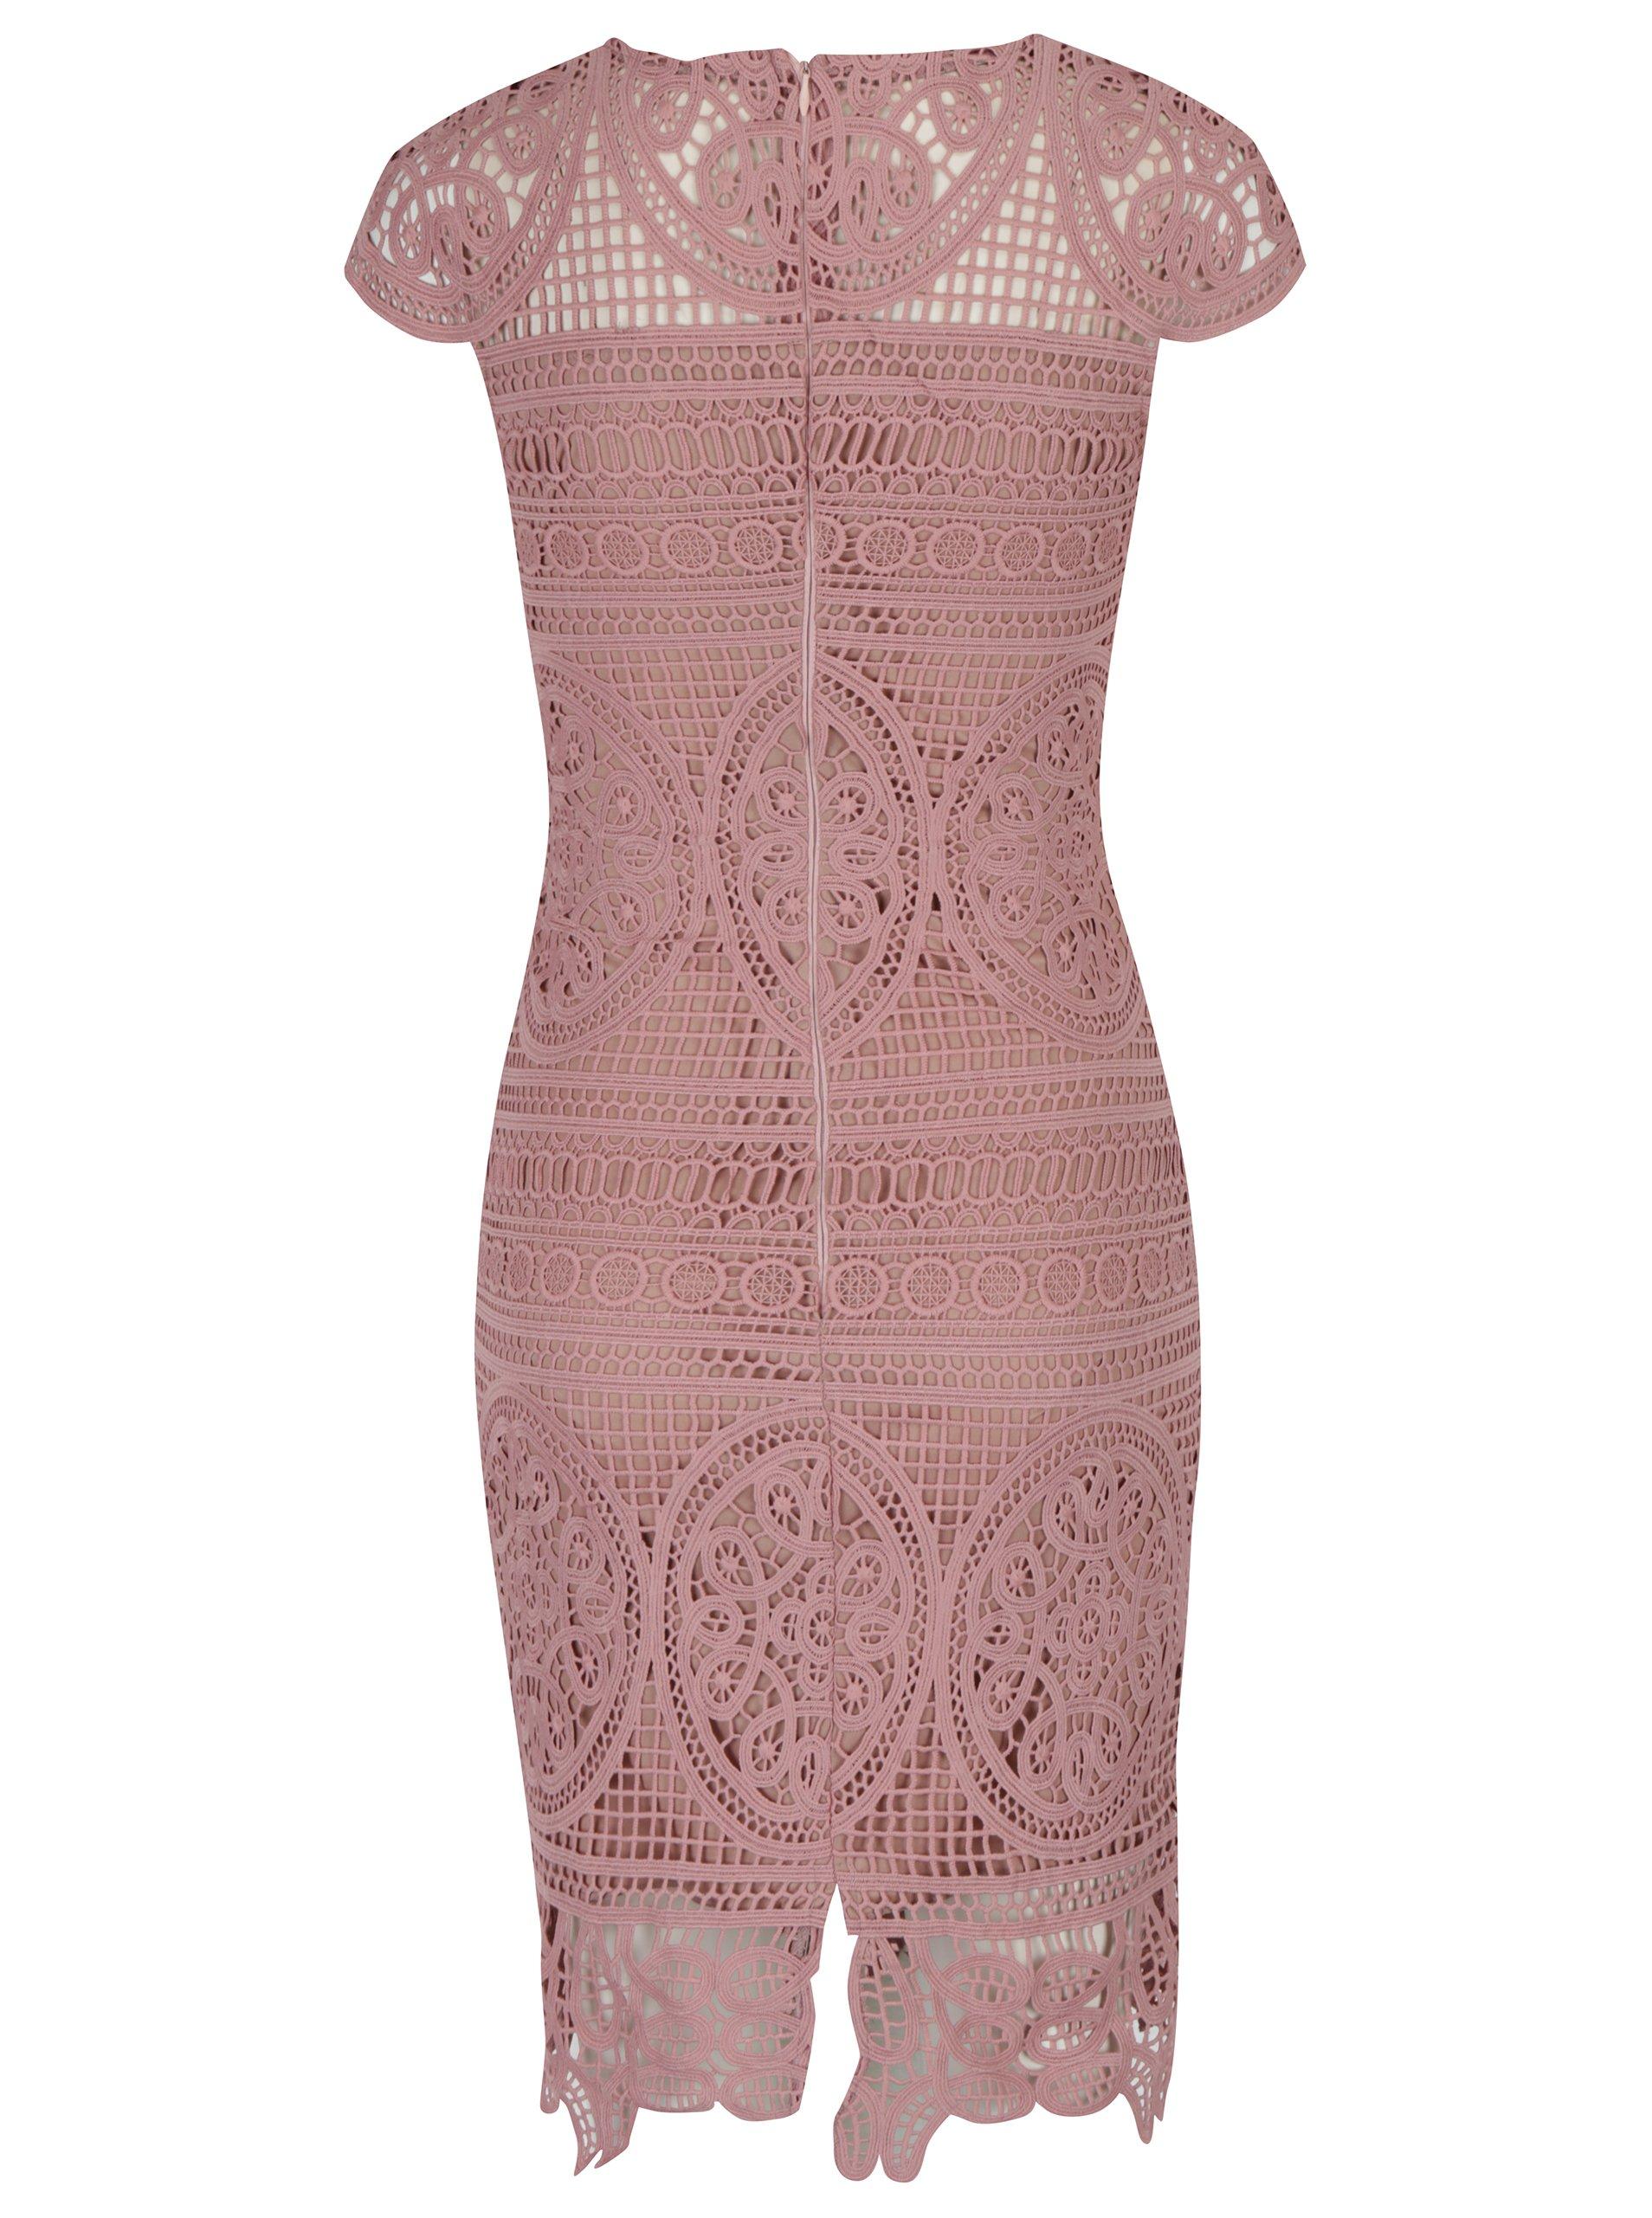 Staroružové čipkované puzdrové šaty Miss Grey Nadia aa620a1c268